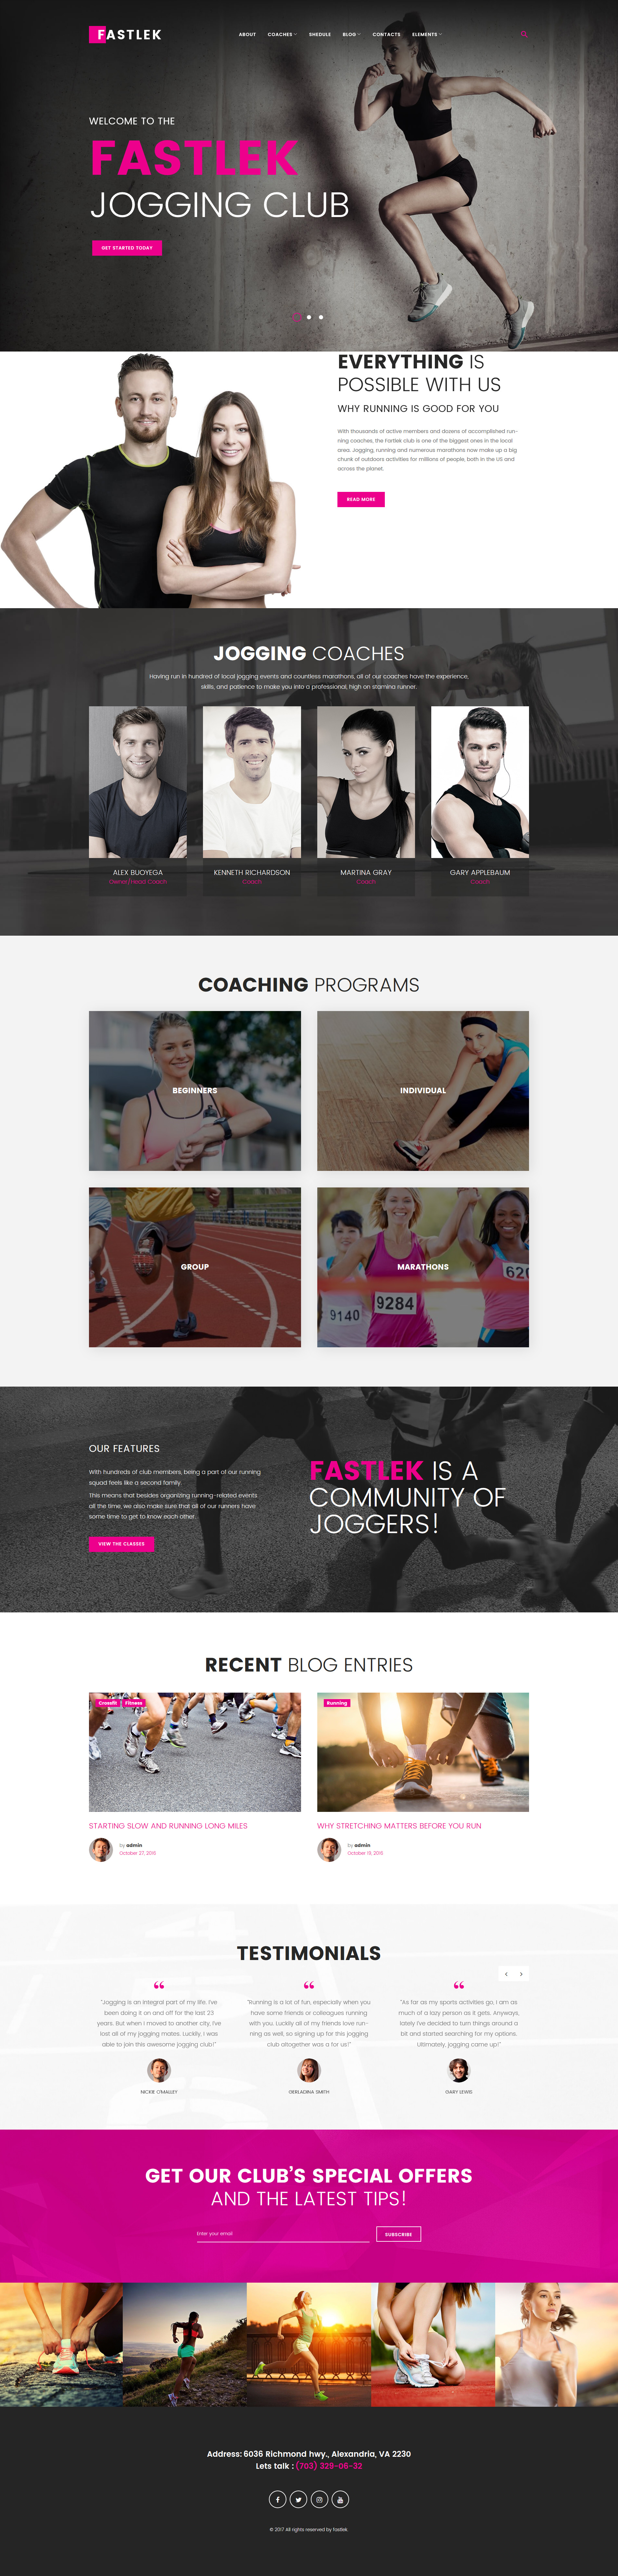 Responsivt Fastlek - Running Club & Coaching WordPress-tema #63582 - skärmbild